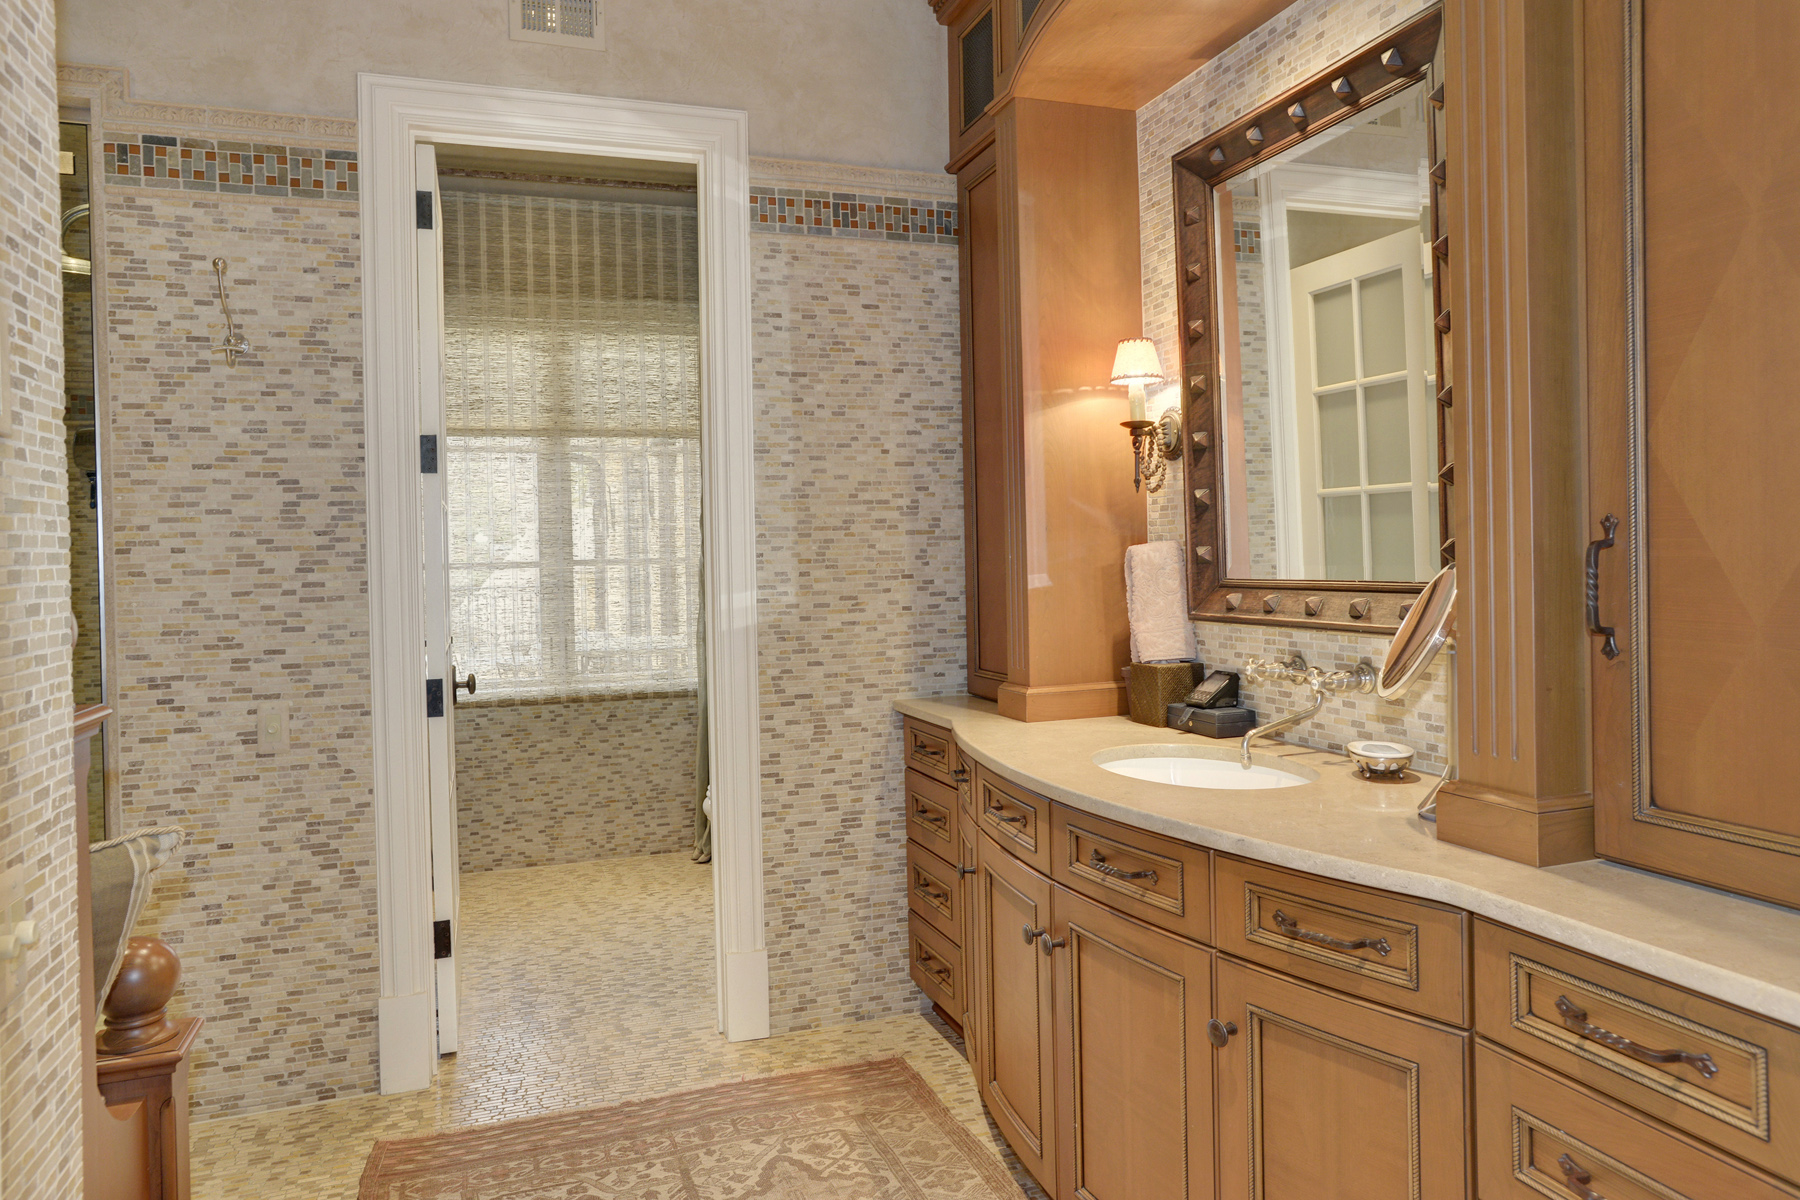 Additional photo for property listing at 5517 Pembroke Road, Bethesda 5517 Pembroke Rd Bethesda, Maryland 20817 United States